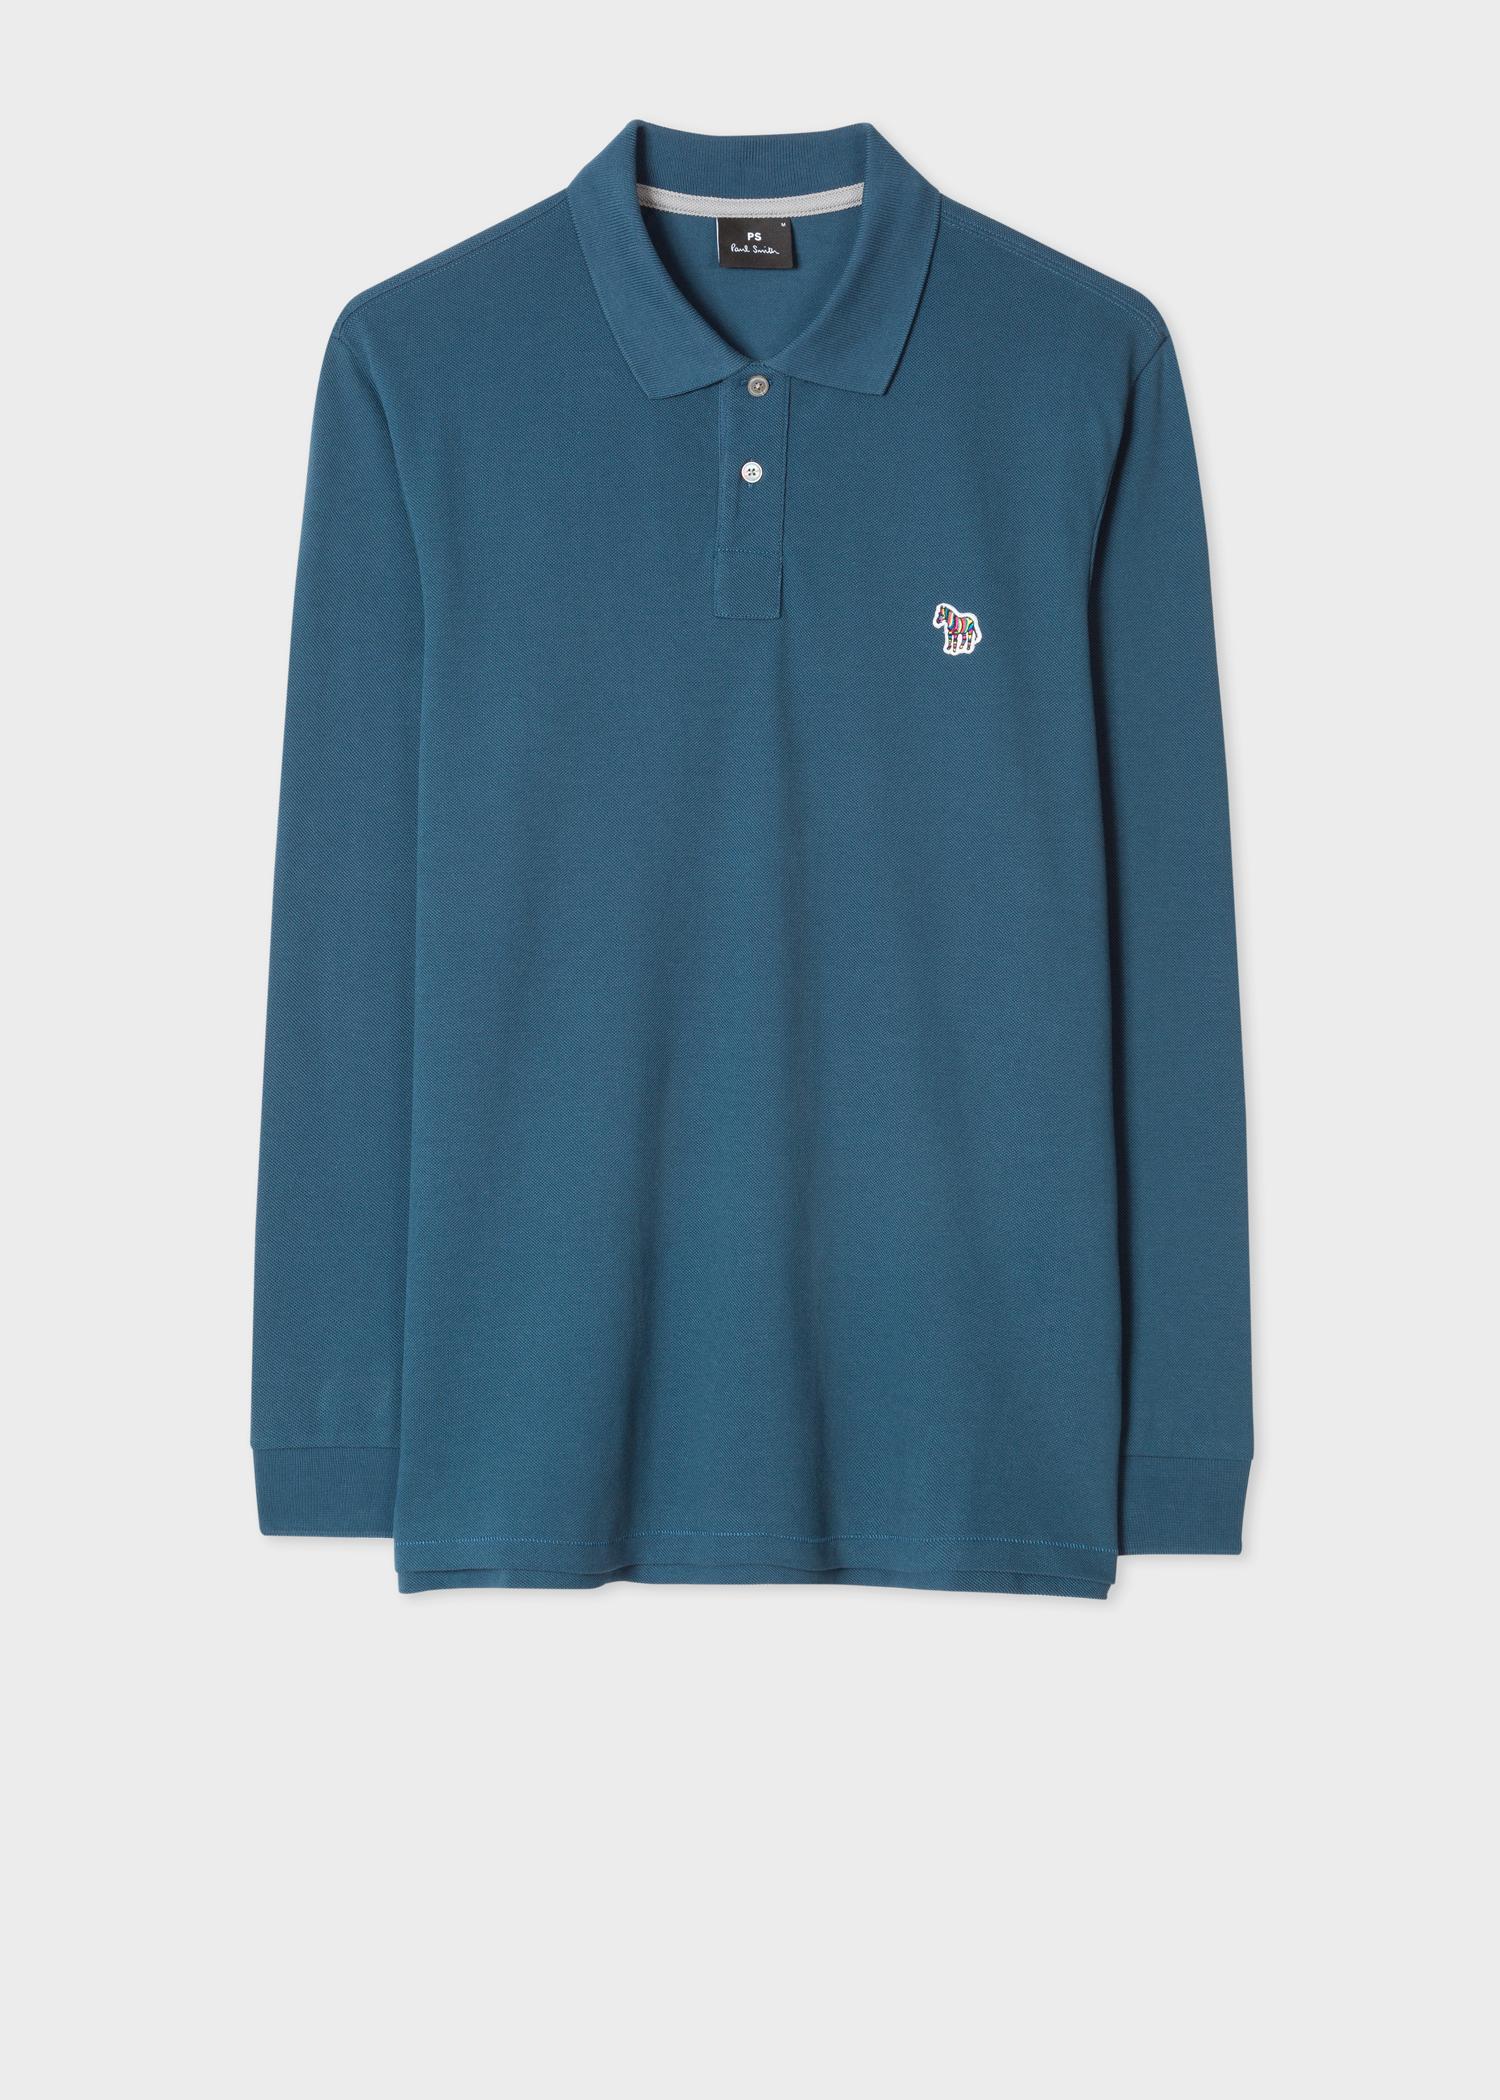 Mens Dark Teal Organic Cotton Zebra Long Sleeve Polo Shirt